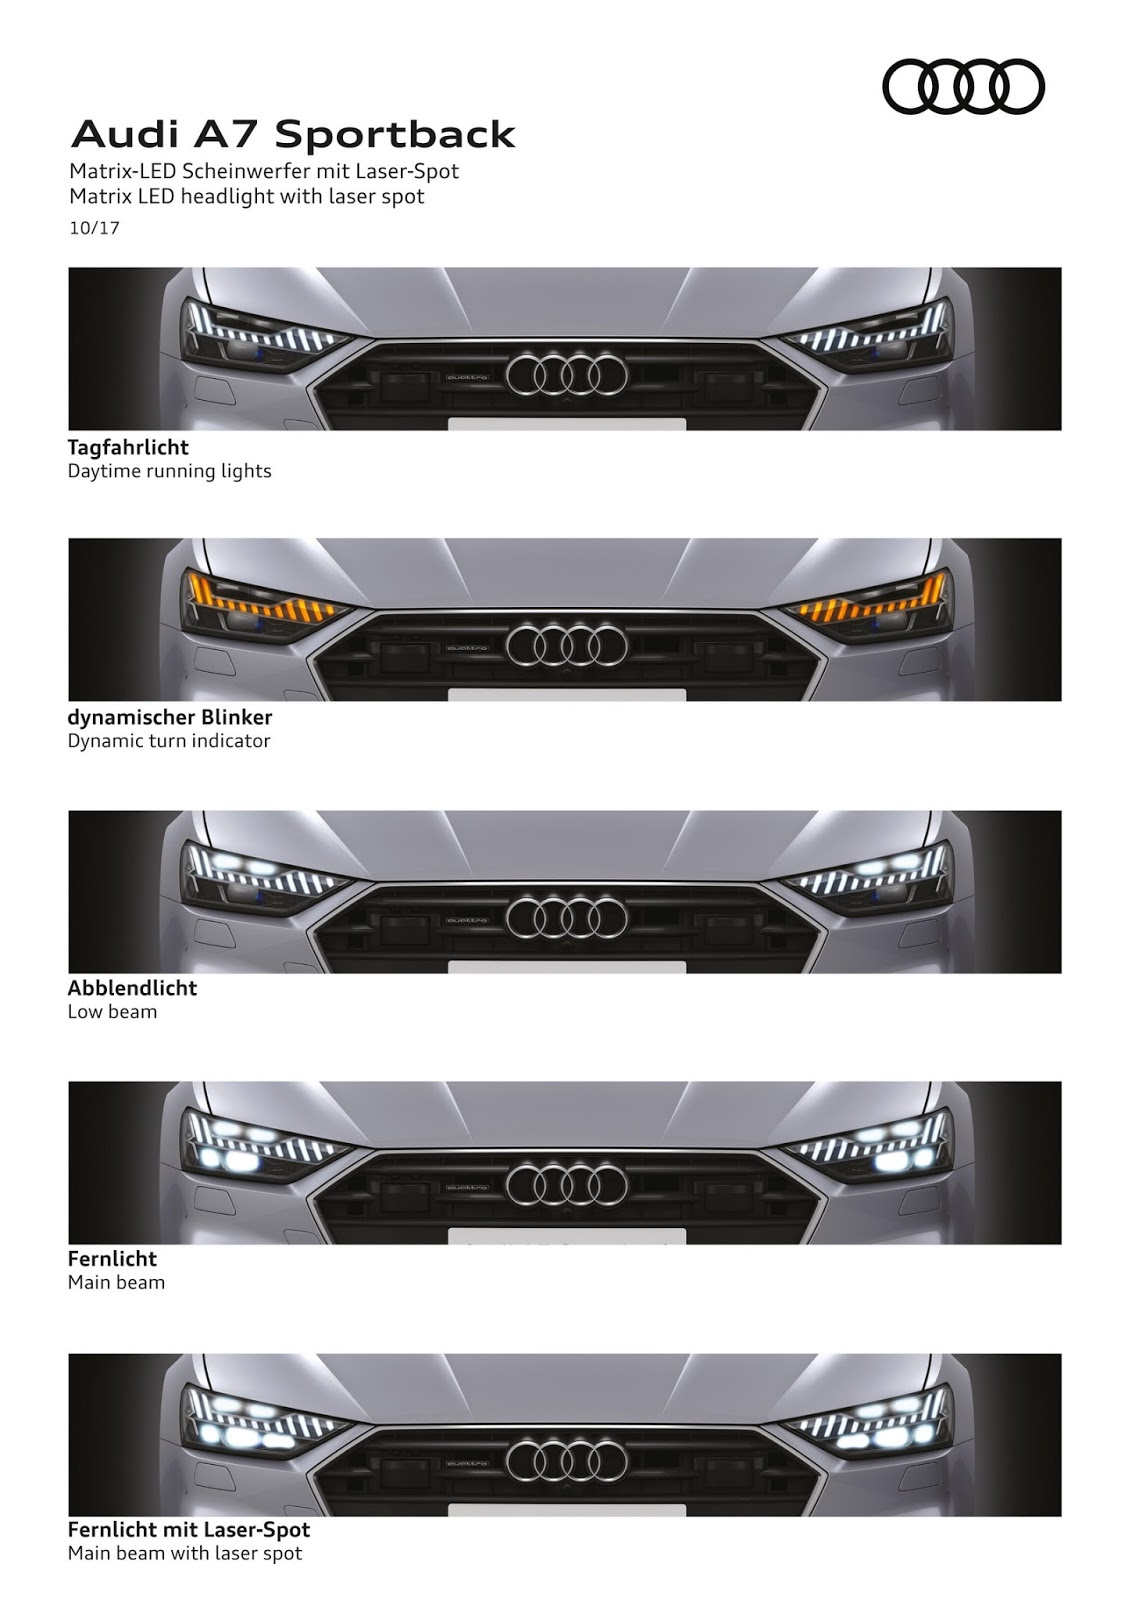 2018_Audi_A7_Sportback_0046